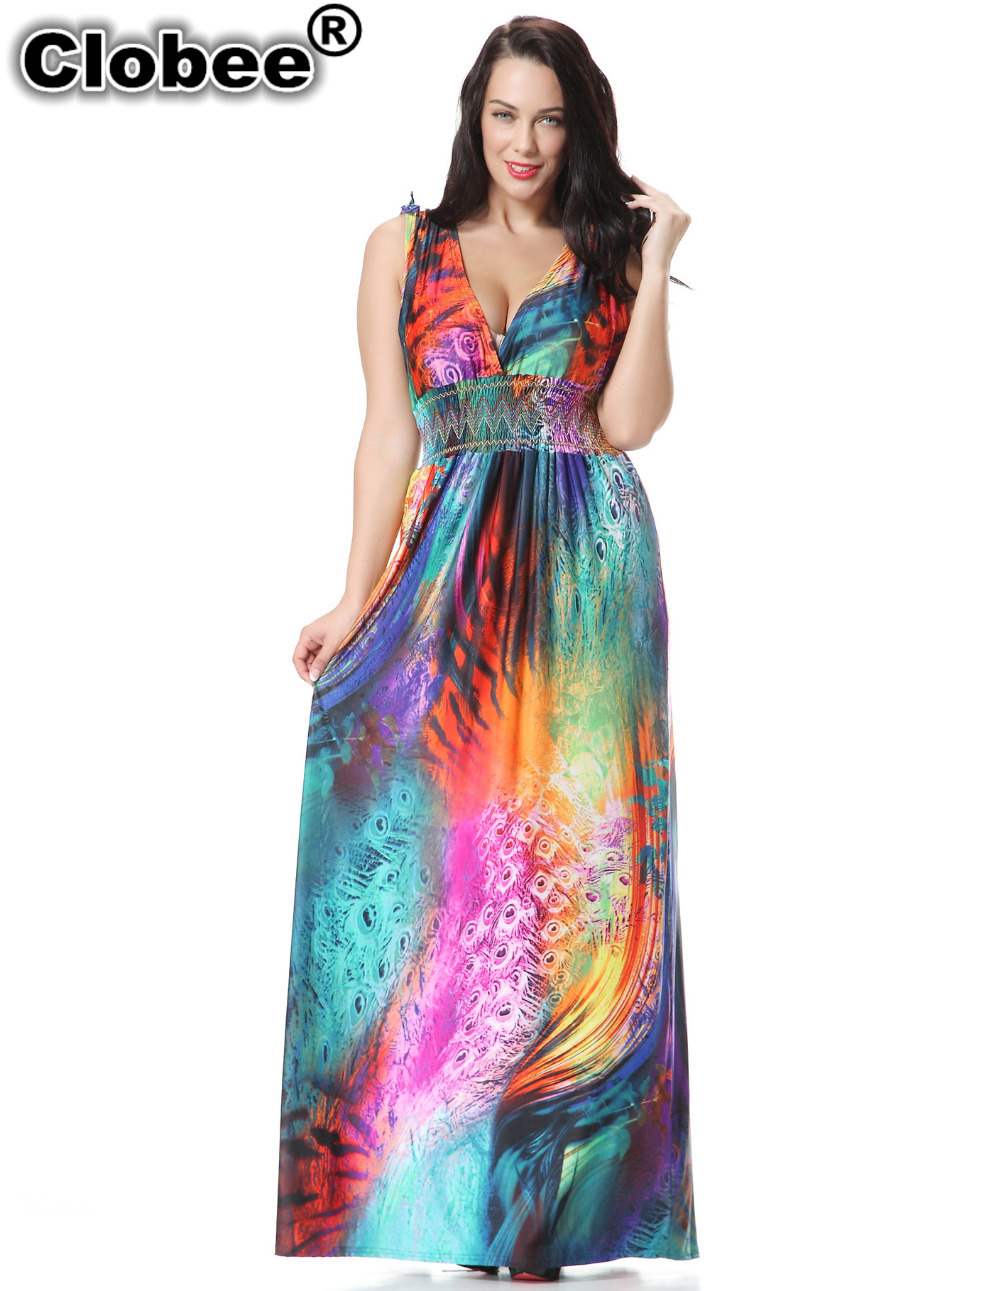 Boho 2019 Women Summer Boho Holiday Beach Dress Plus Size 7XL Printed Long Maxi Dress Elbise Robe ete Jurk Robe Longue chemise